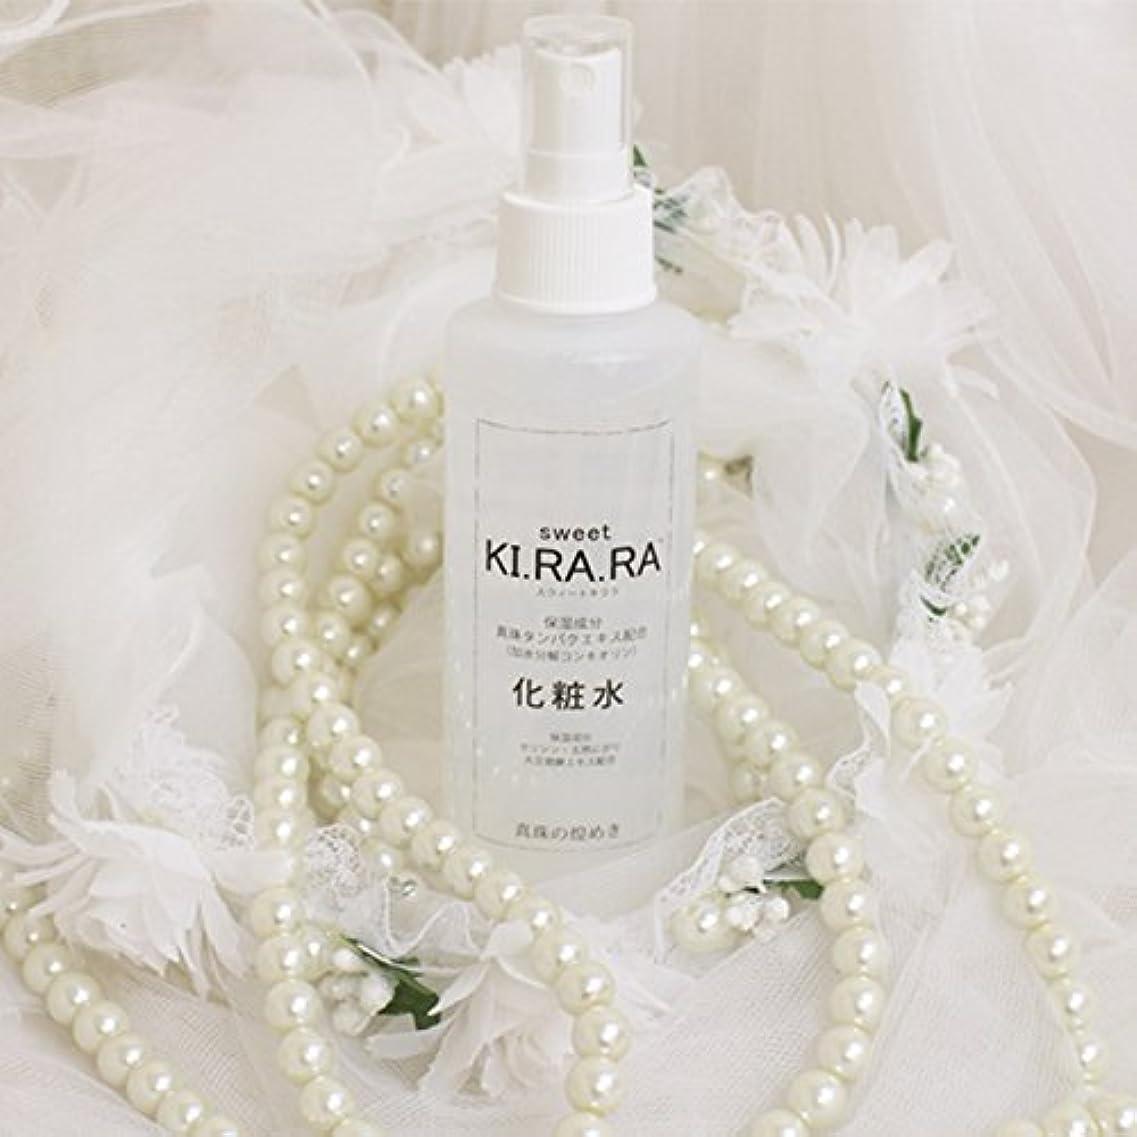 sweet KI.RA.RA スウィートキララ 化粧水 ナチュラルローション 真珠タンパクエキス配合 150ml